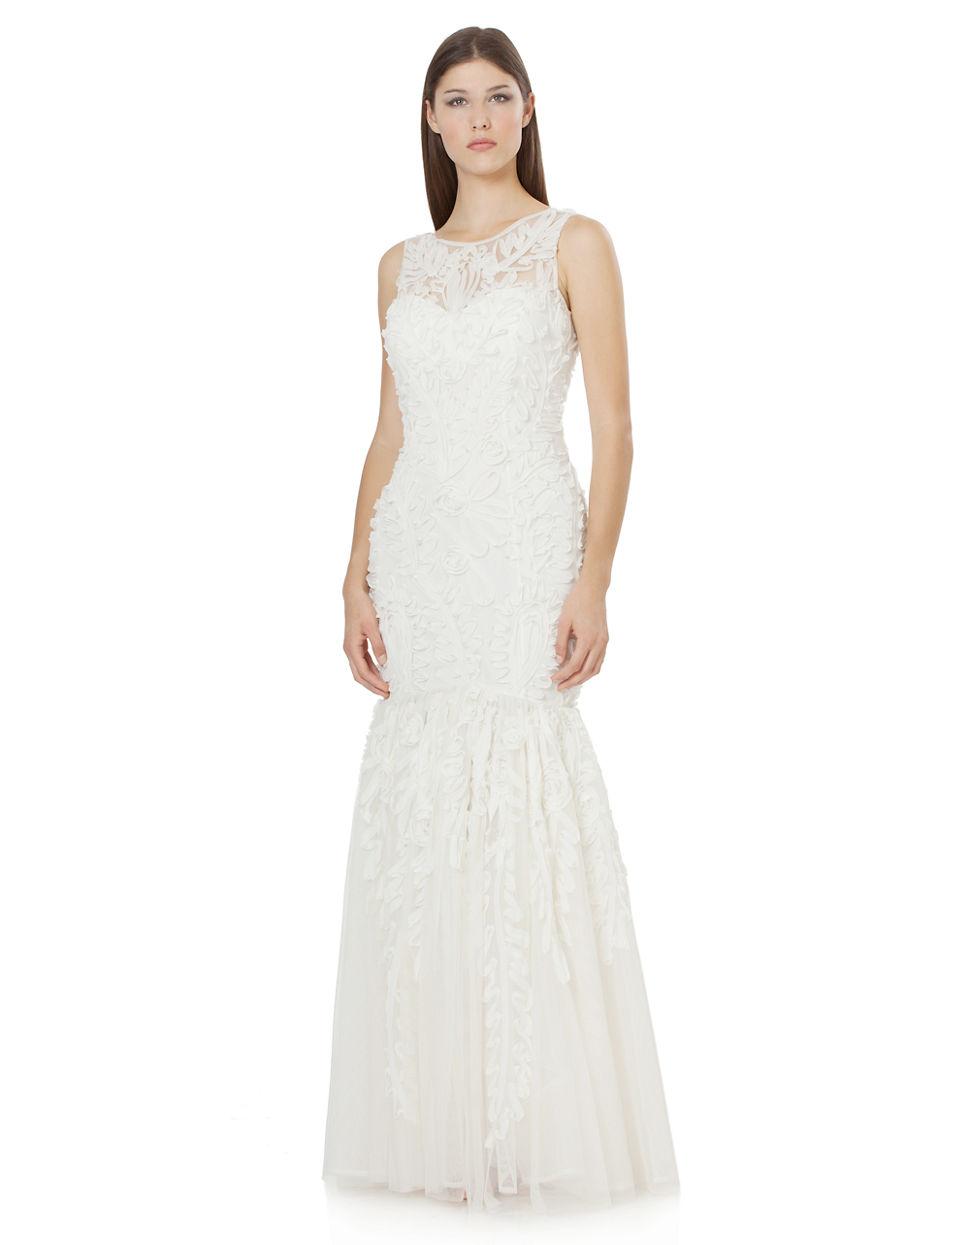 JS Collections Dresses   Dress images